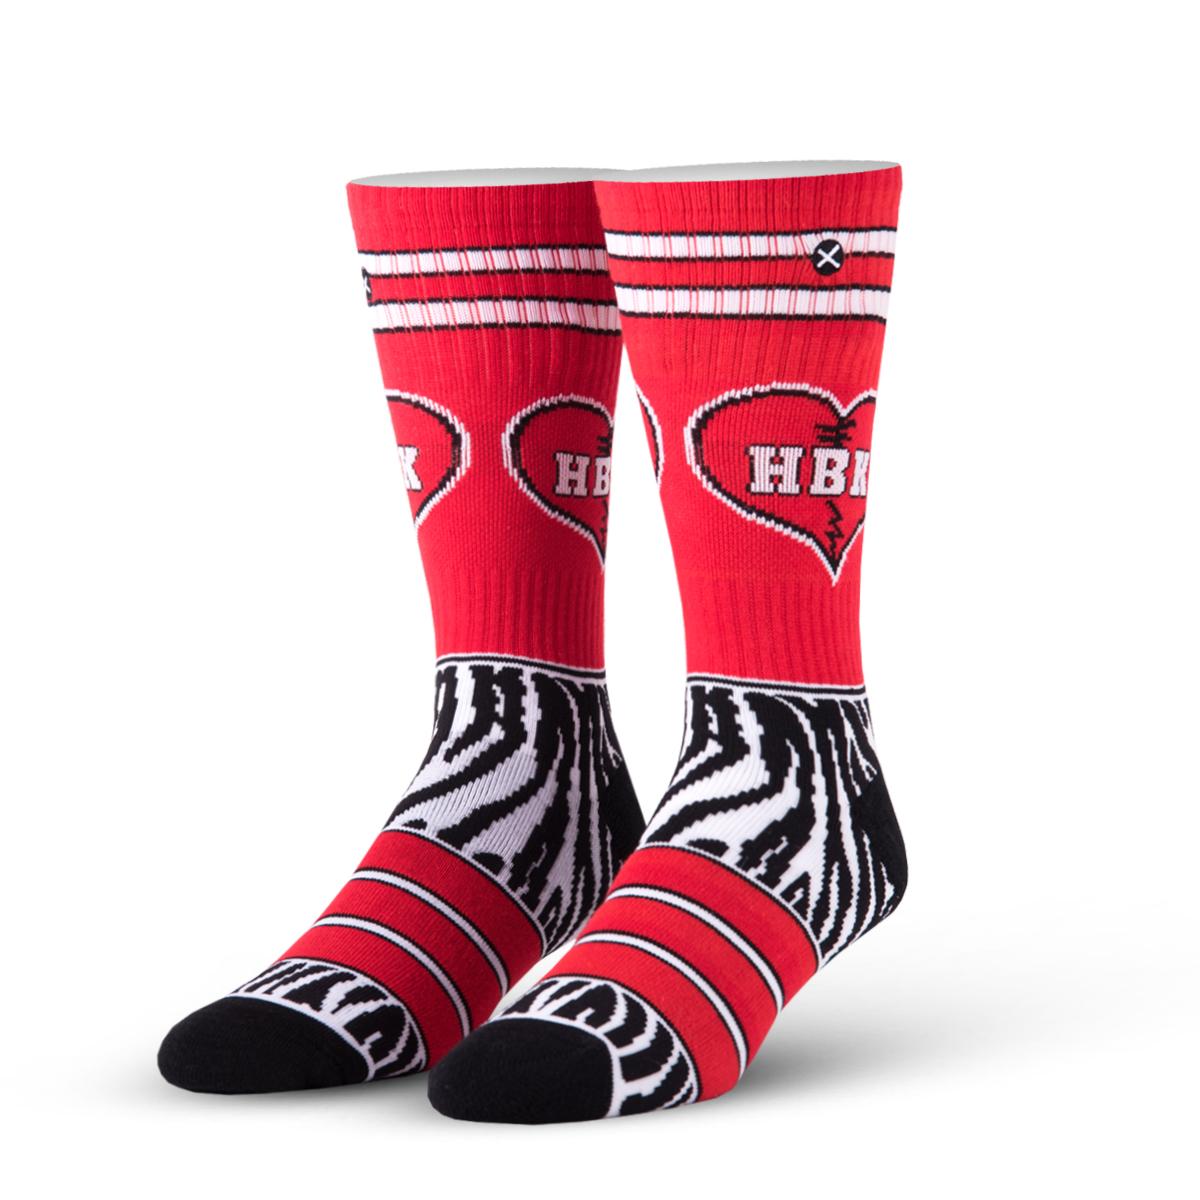 Odd Sox WWE The Heartbreak Kid Crew Socks, 6-13